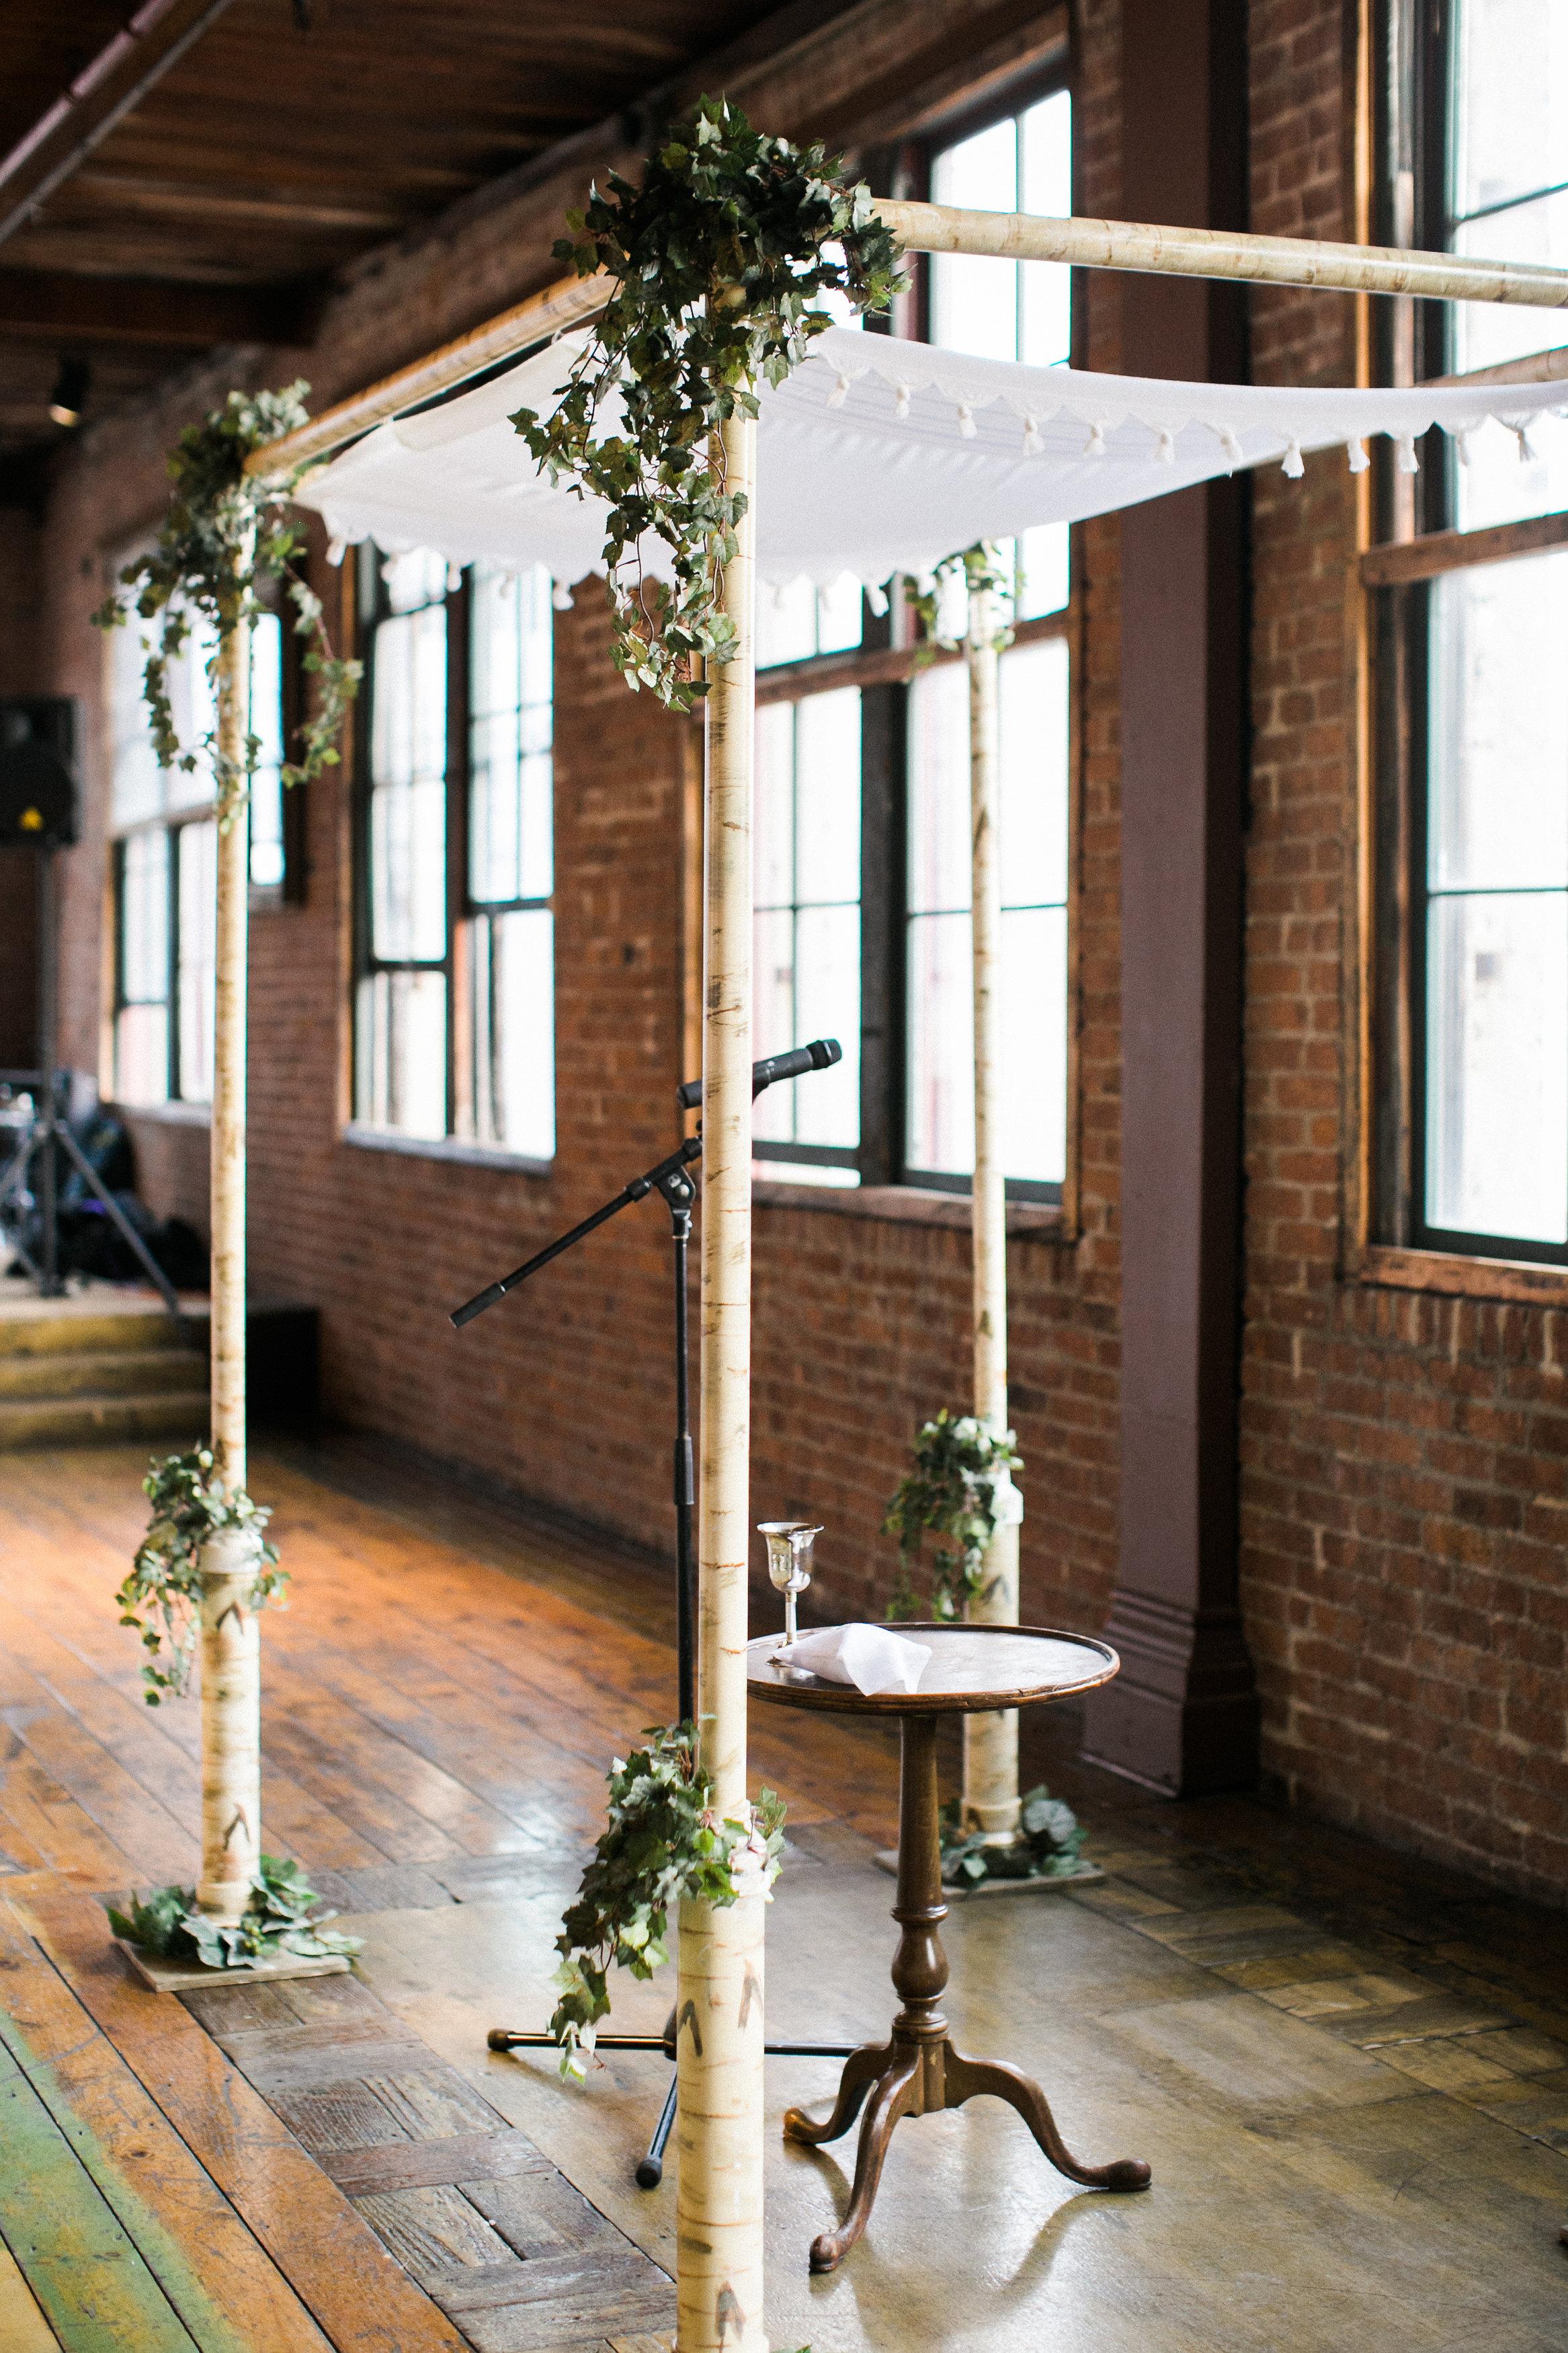 sam-and-jon_metropolitan-building-nyc-wedding-40-6.jpg